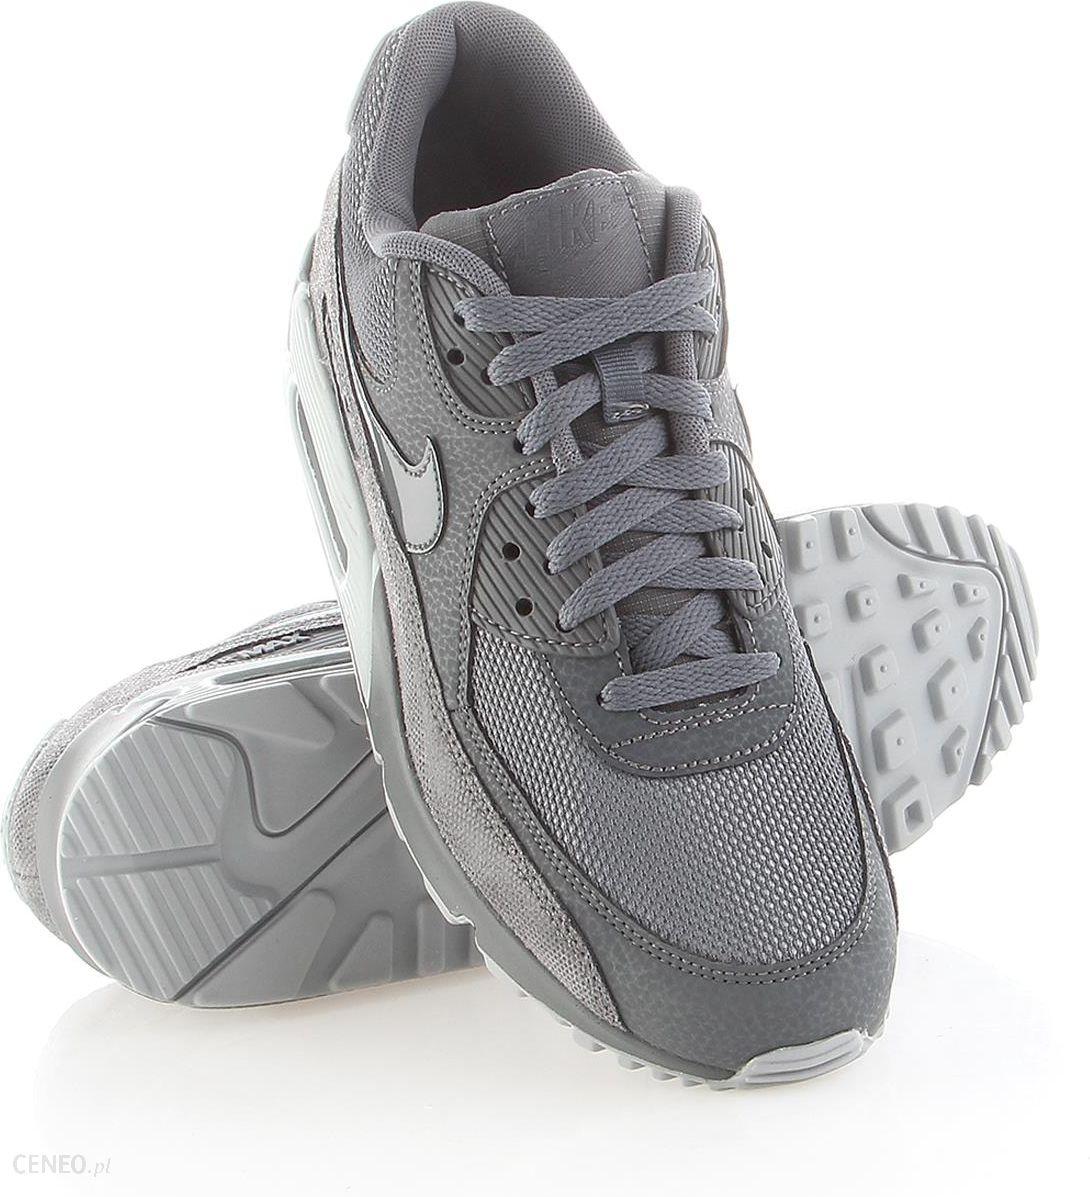 Nike Air Max 90 Wmns 443817 004 szare, damskie, rozmiar